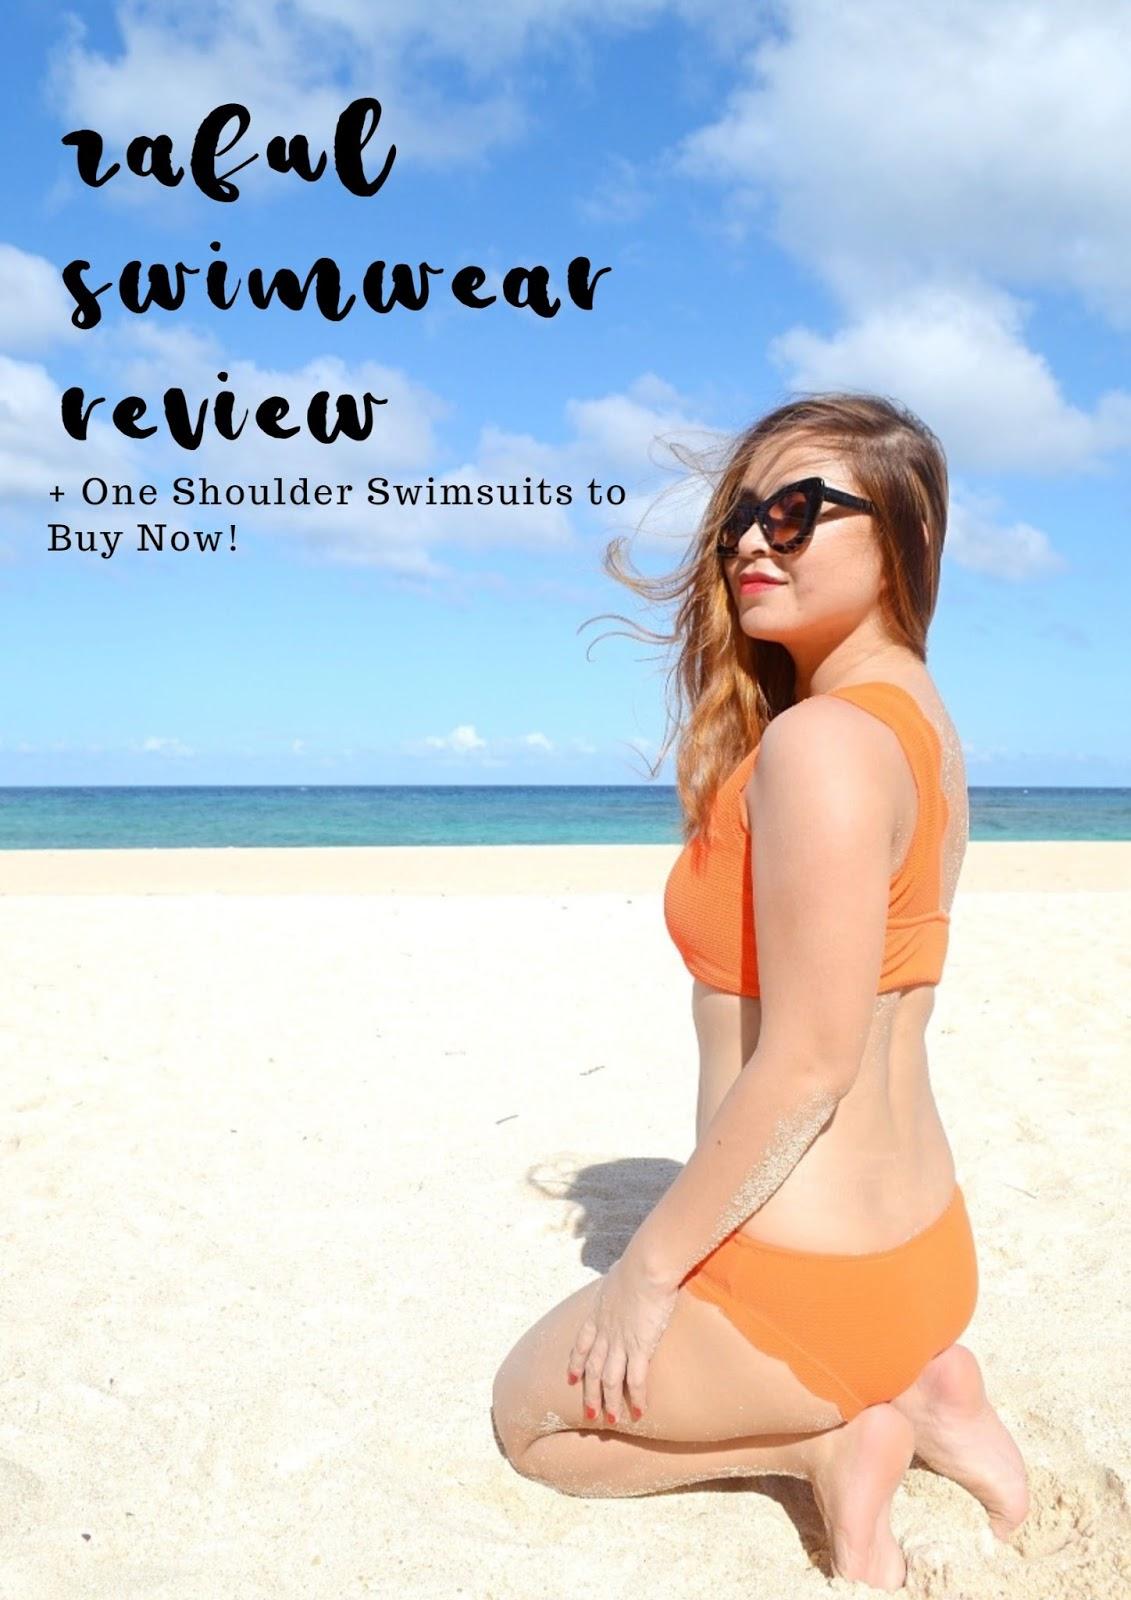 8a829d9e085 Zaful Swimwear Review + One Shoulder Bikinis You'll Want NOW